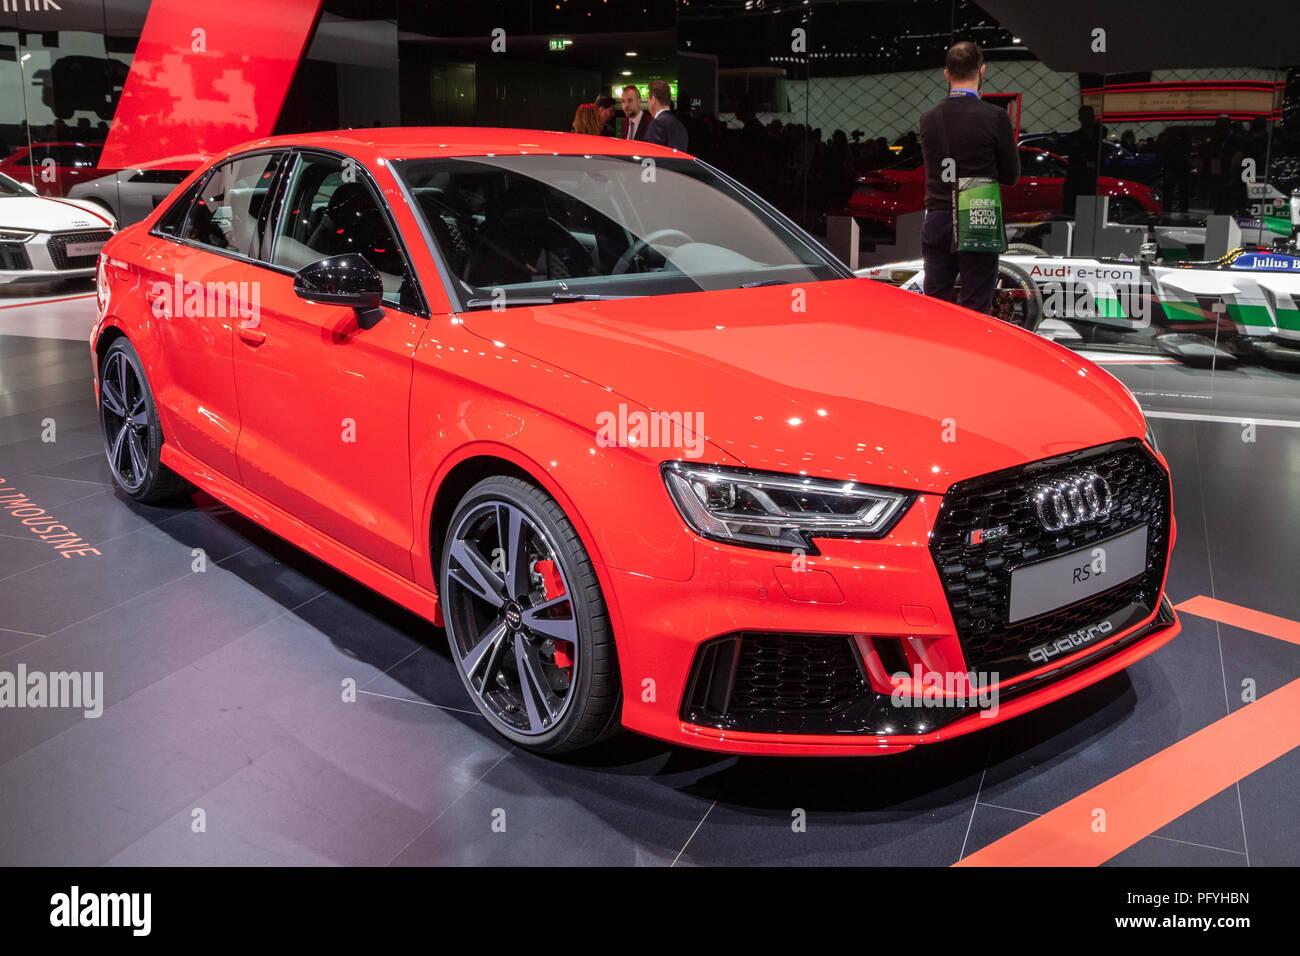 Kelebihan Kekurangan Audi Rs3 Quattro Murah Berkualitas